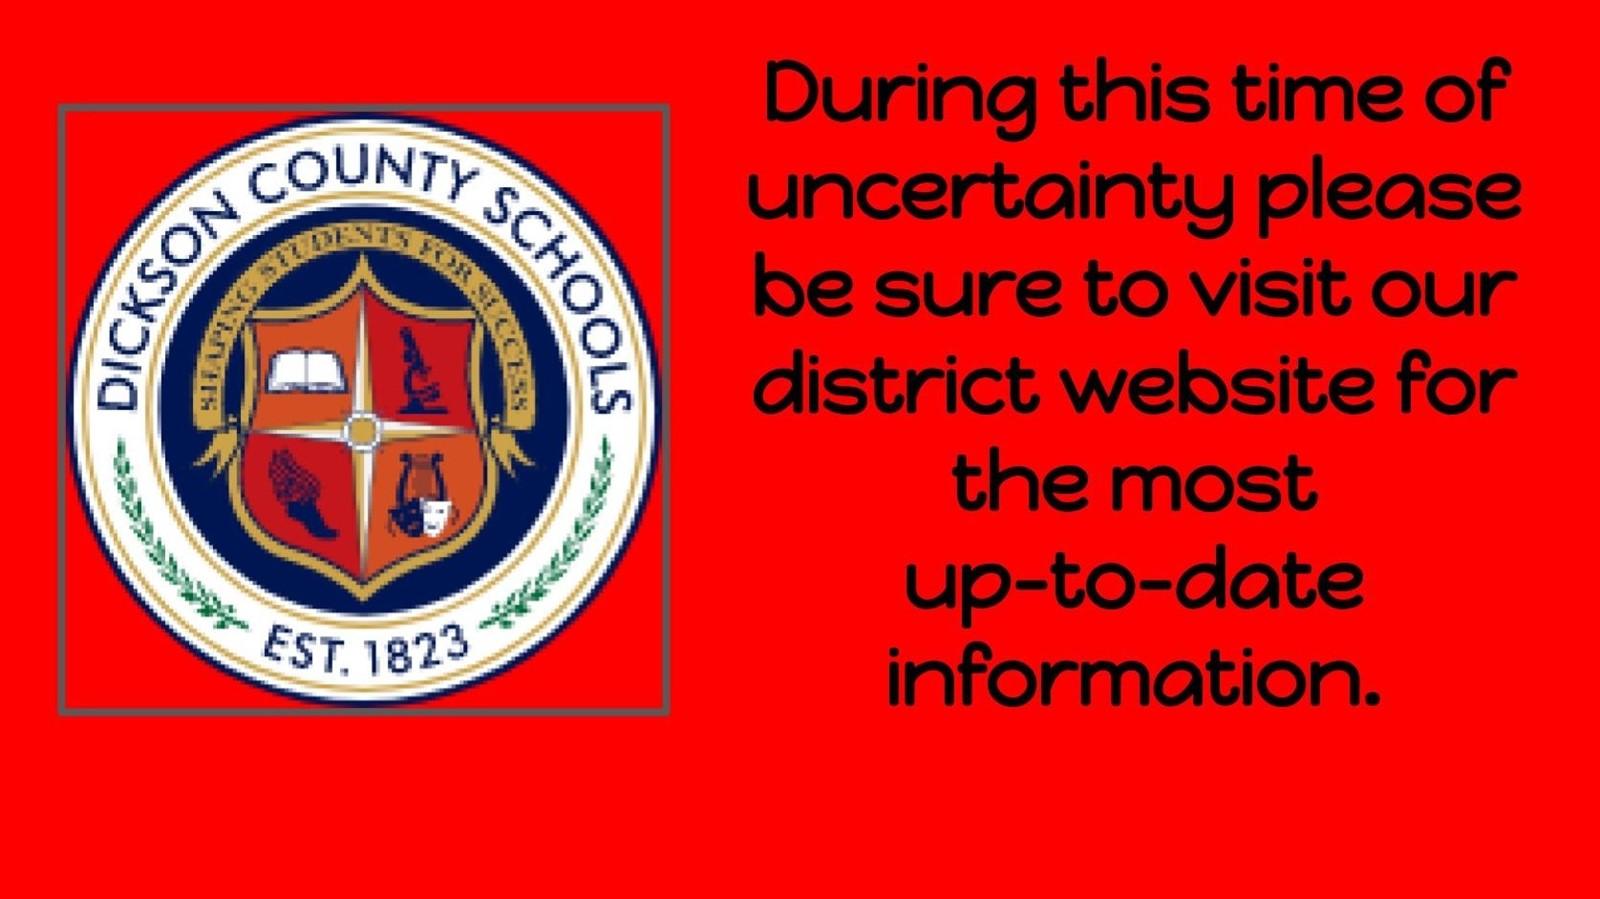 District Website link